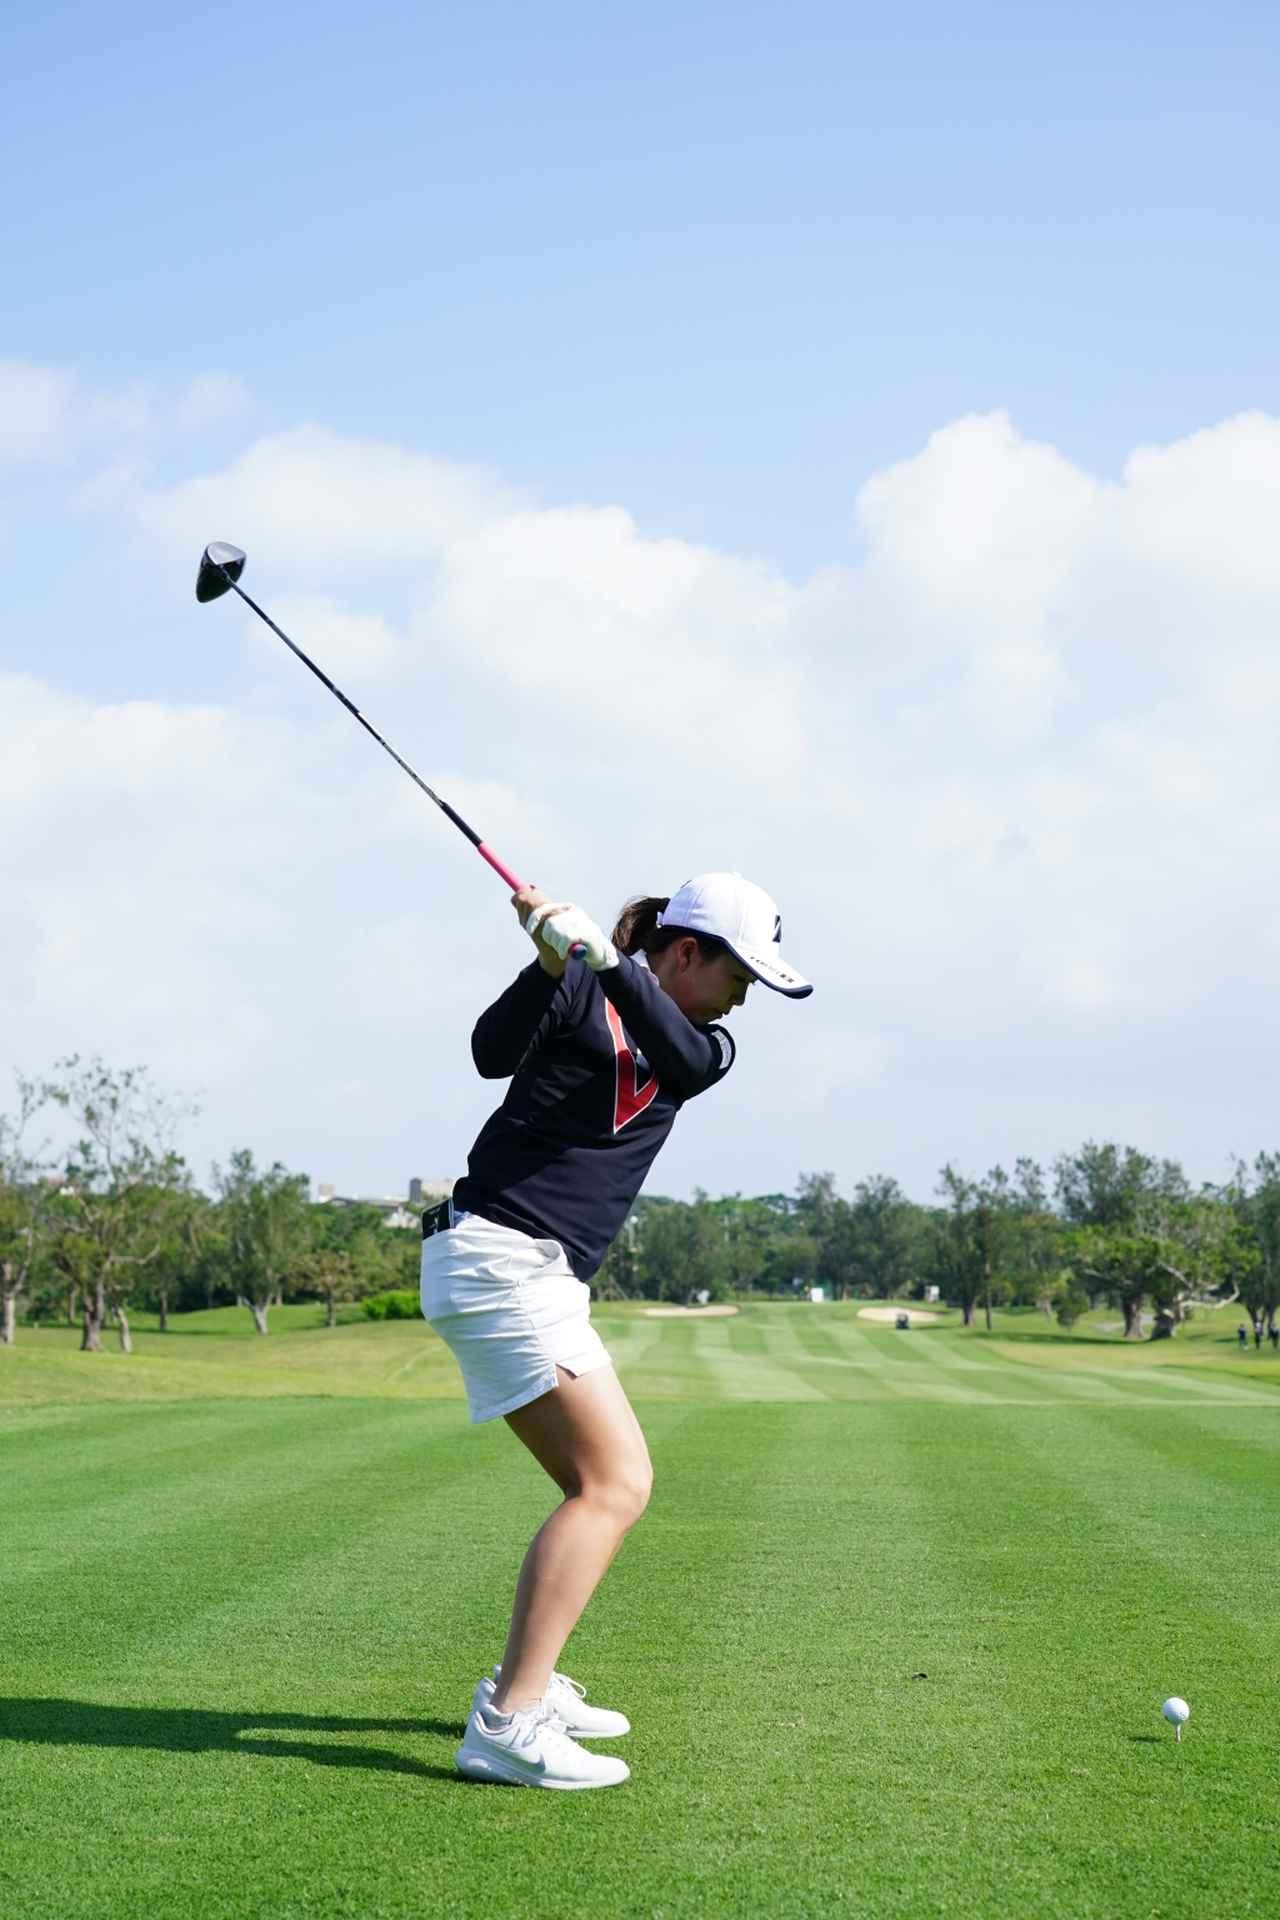 Images : 11番目の画像 - 丹萌乃のドライバー連続写真 - みんなのゴルフダイジェスト